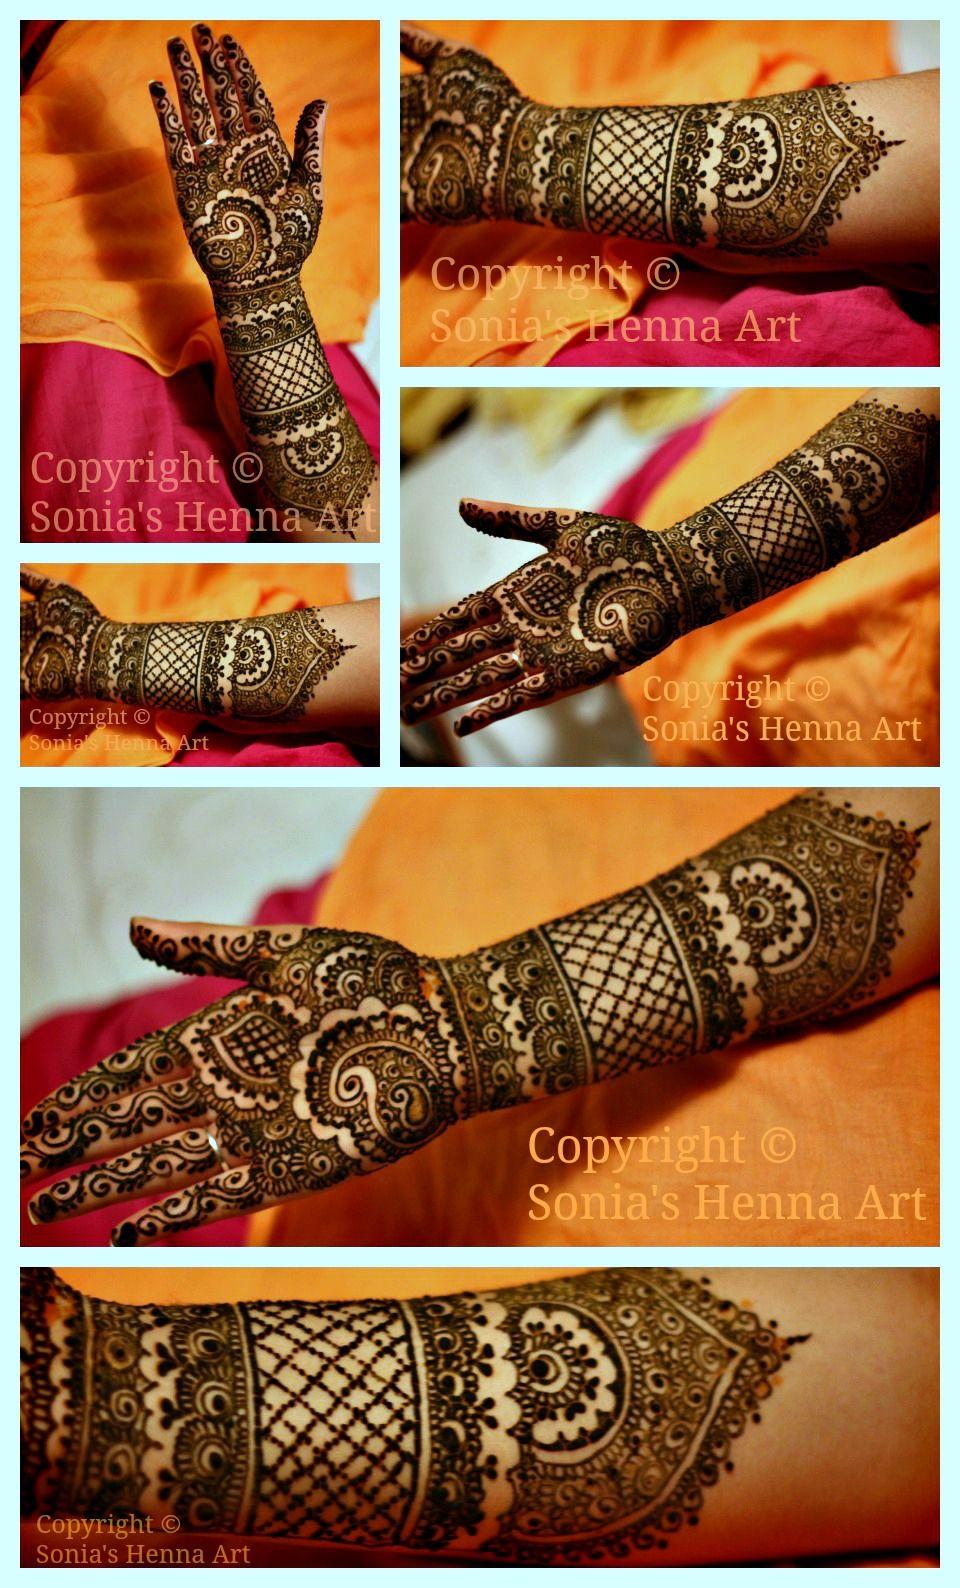 a124764c54e4d60307f8cfb6387702c5 - Traditional Wedding Henna